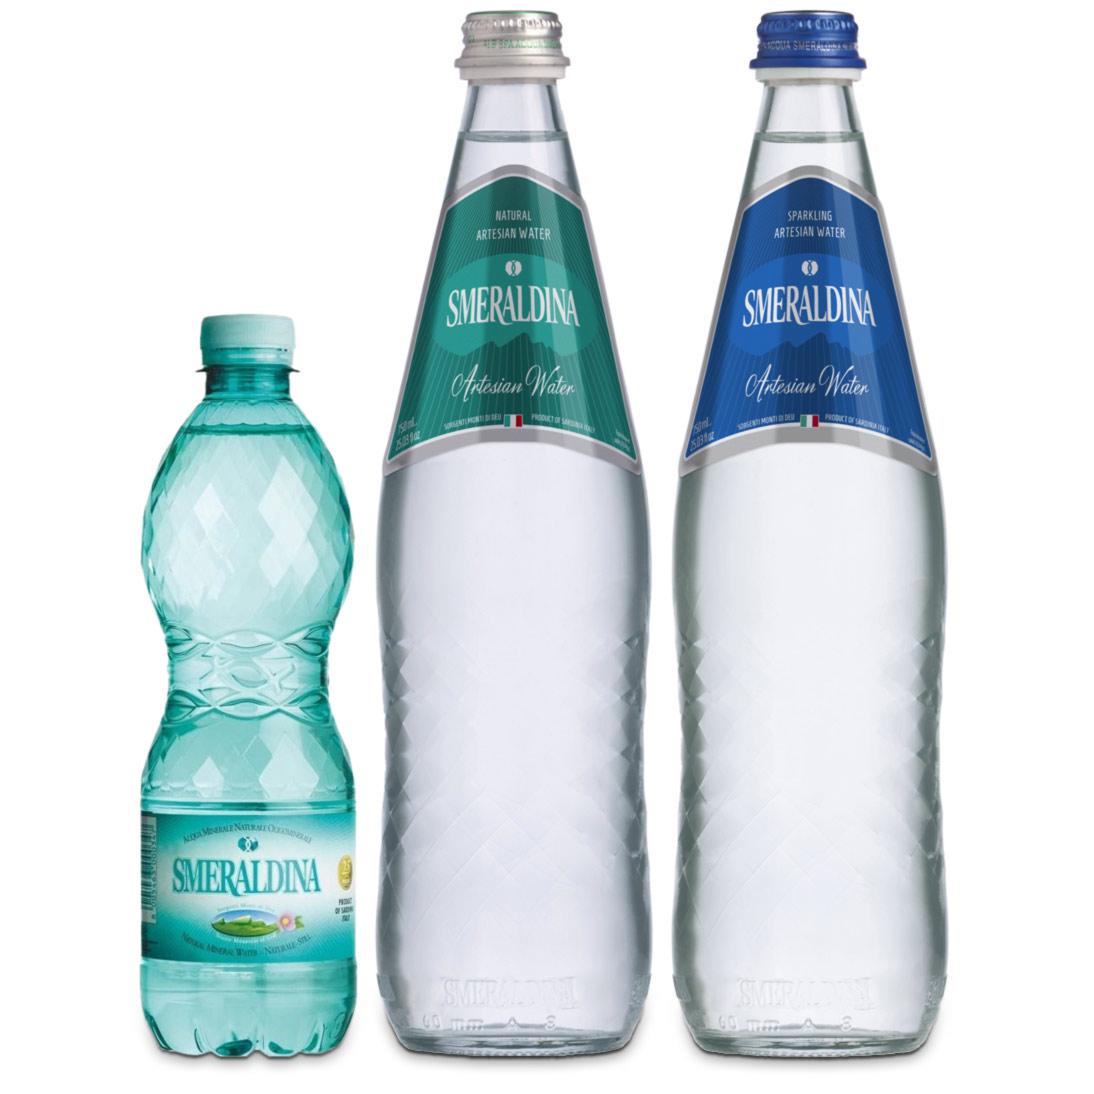 Smeraldina artesian water